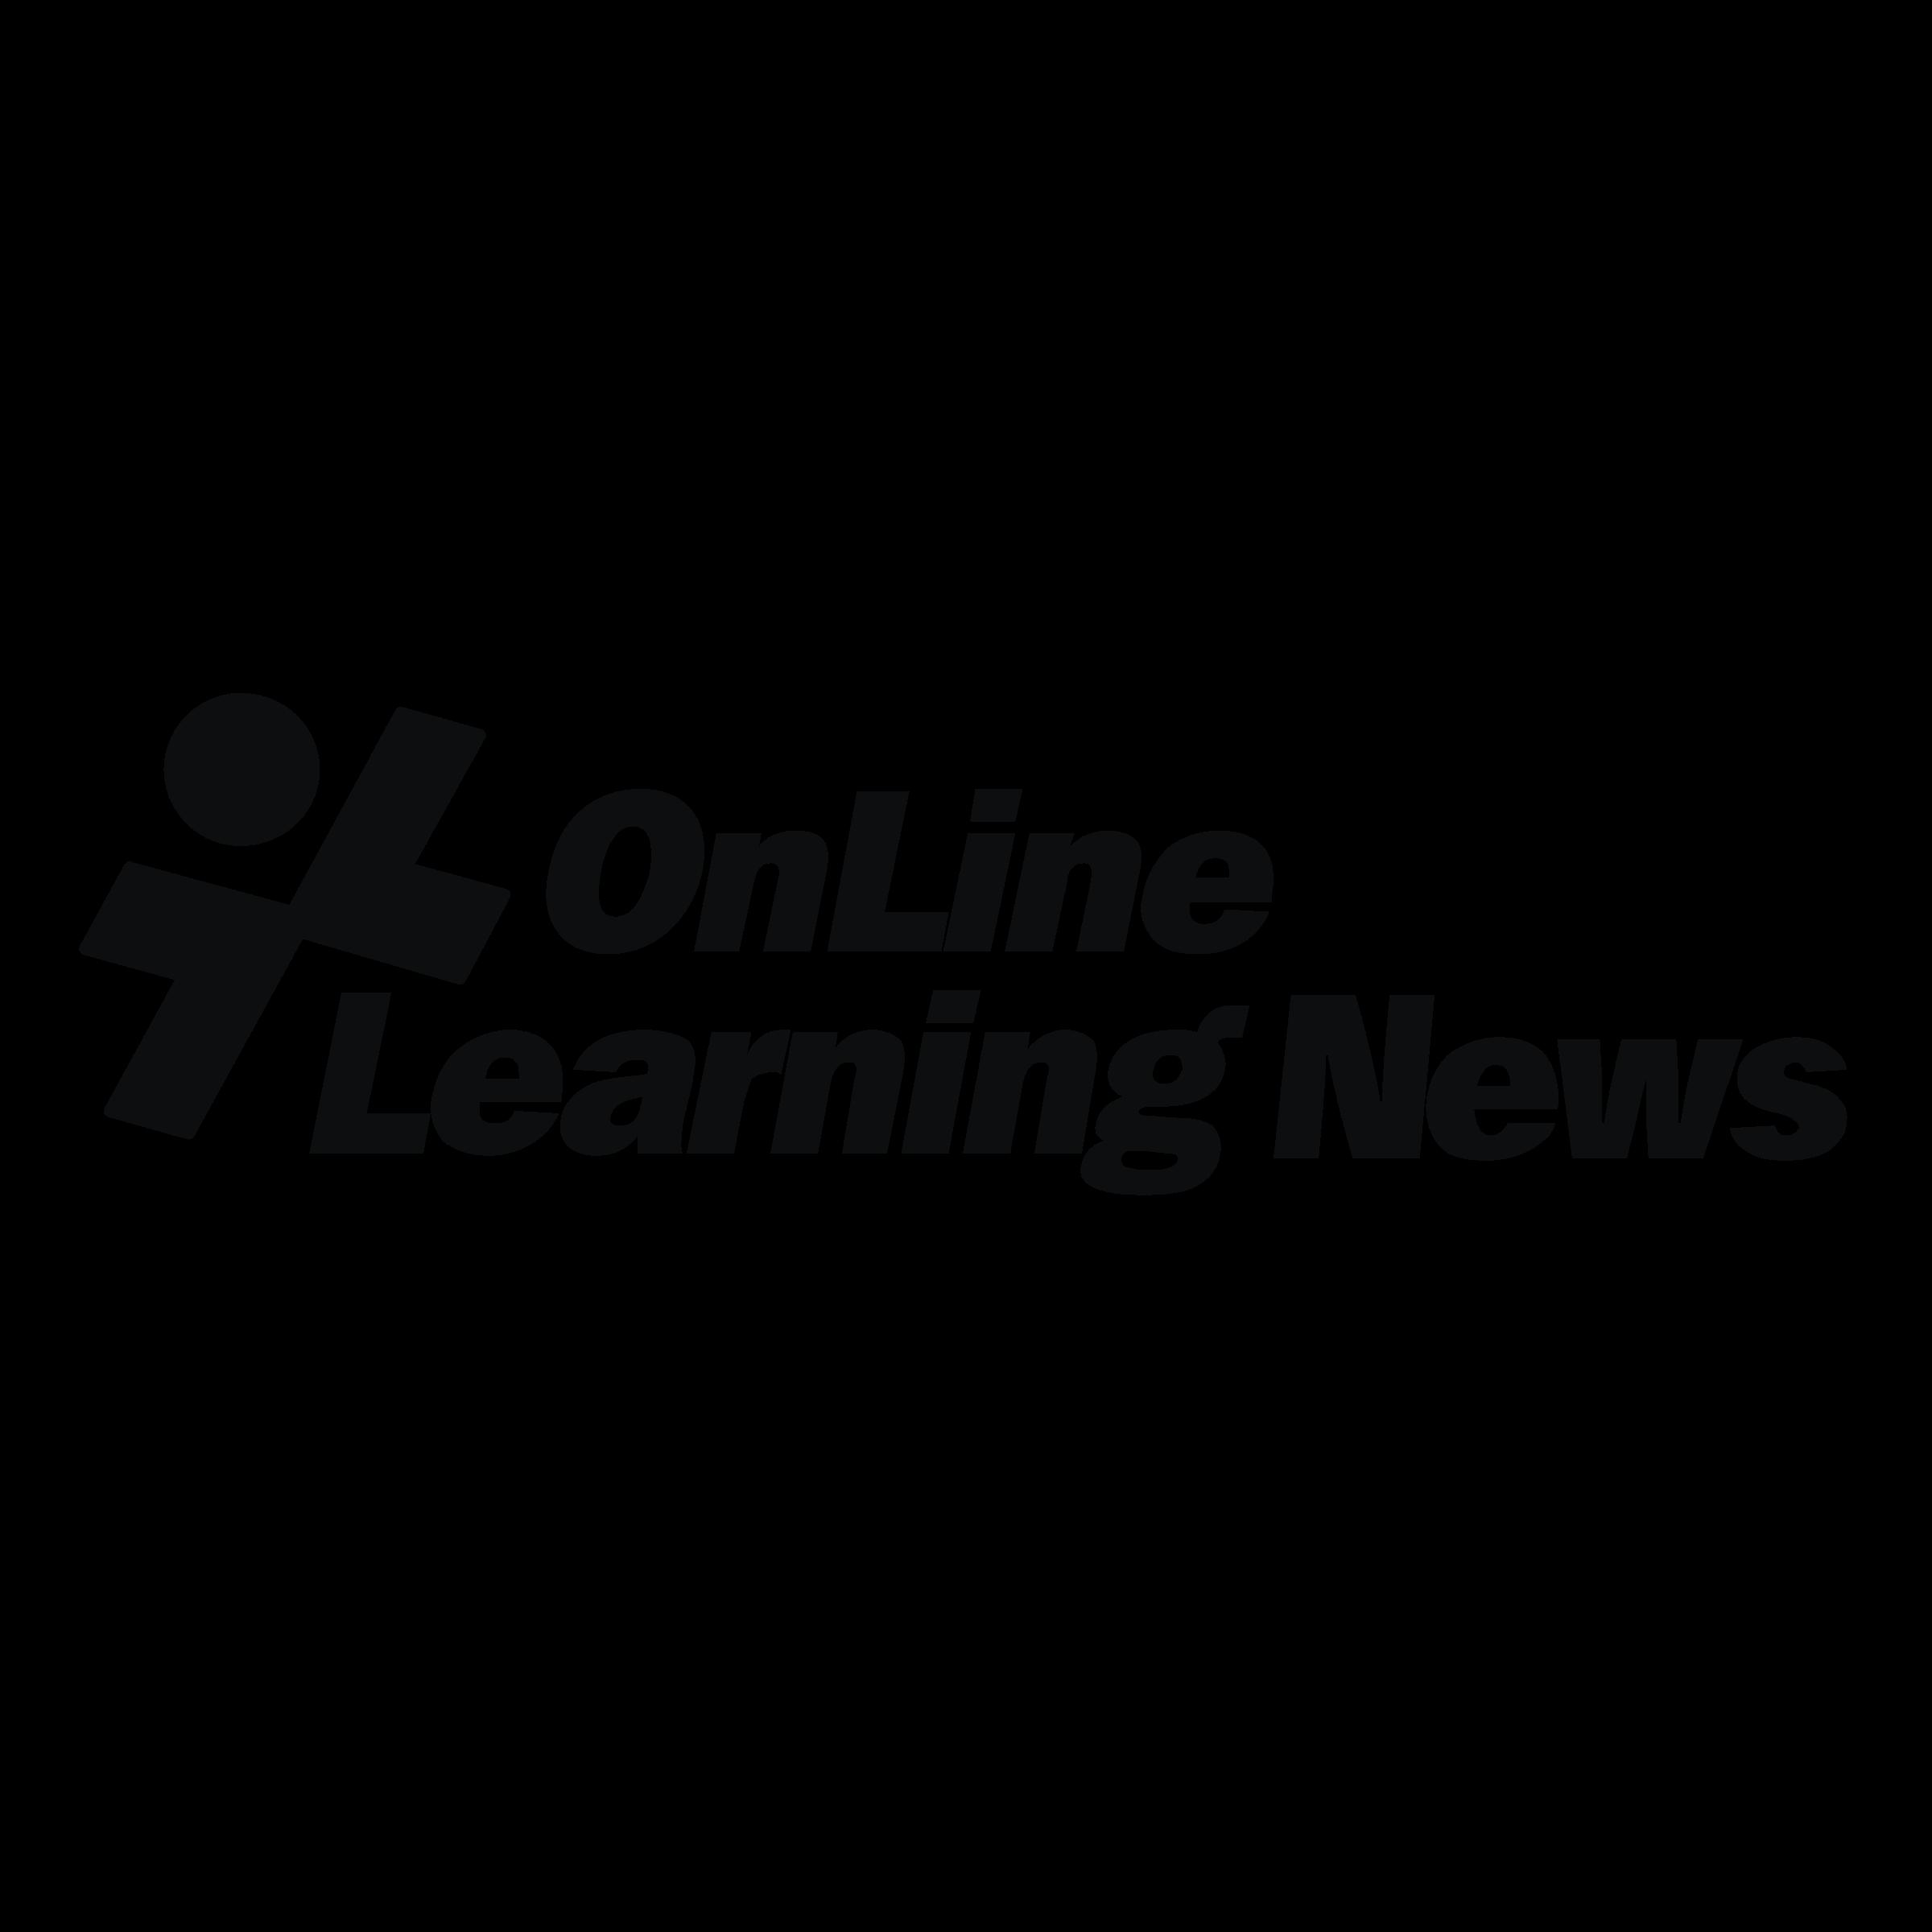 OnLine Learning News Logo PNG Transparent